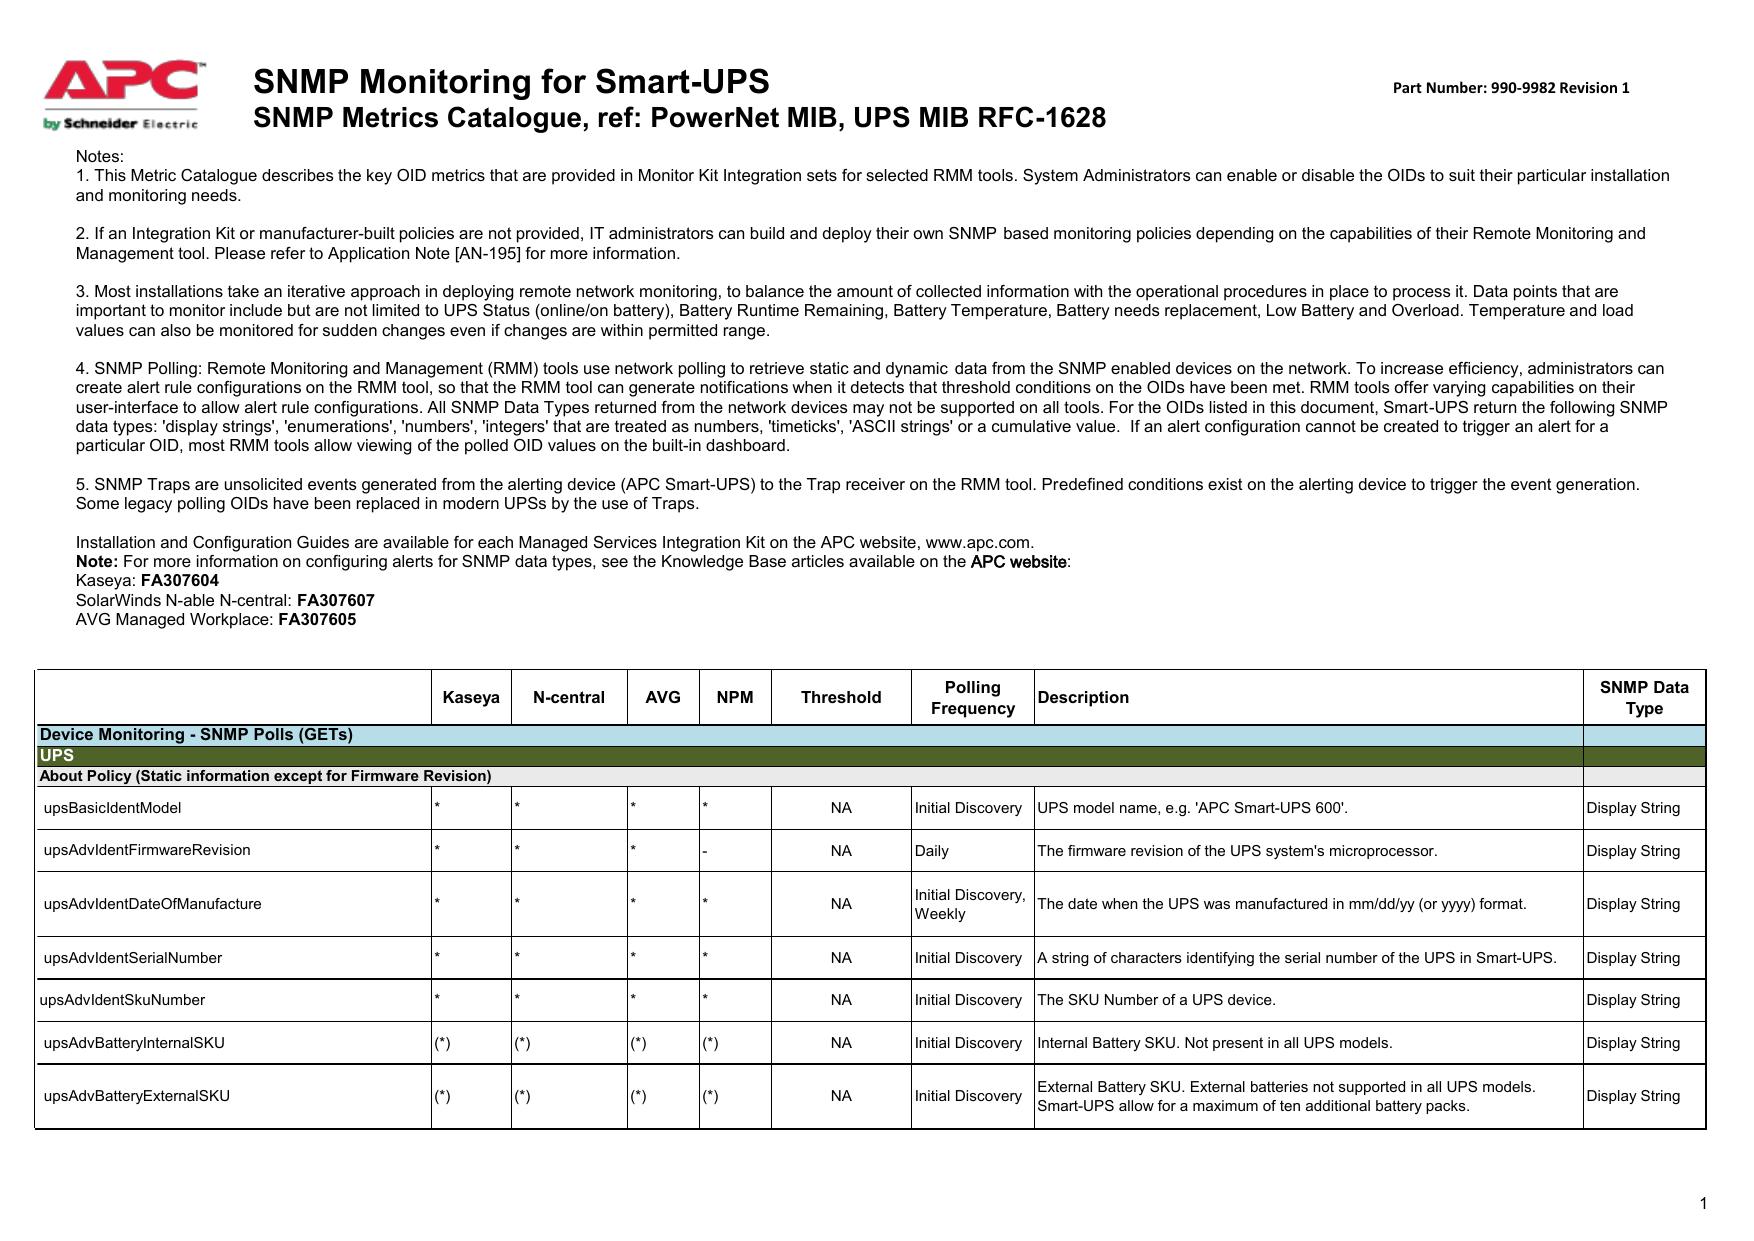 SNMP Monitoring for Smart-UPS - SNMP Metrics Catalog